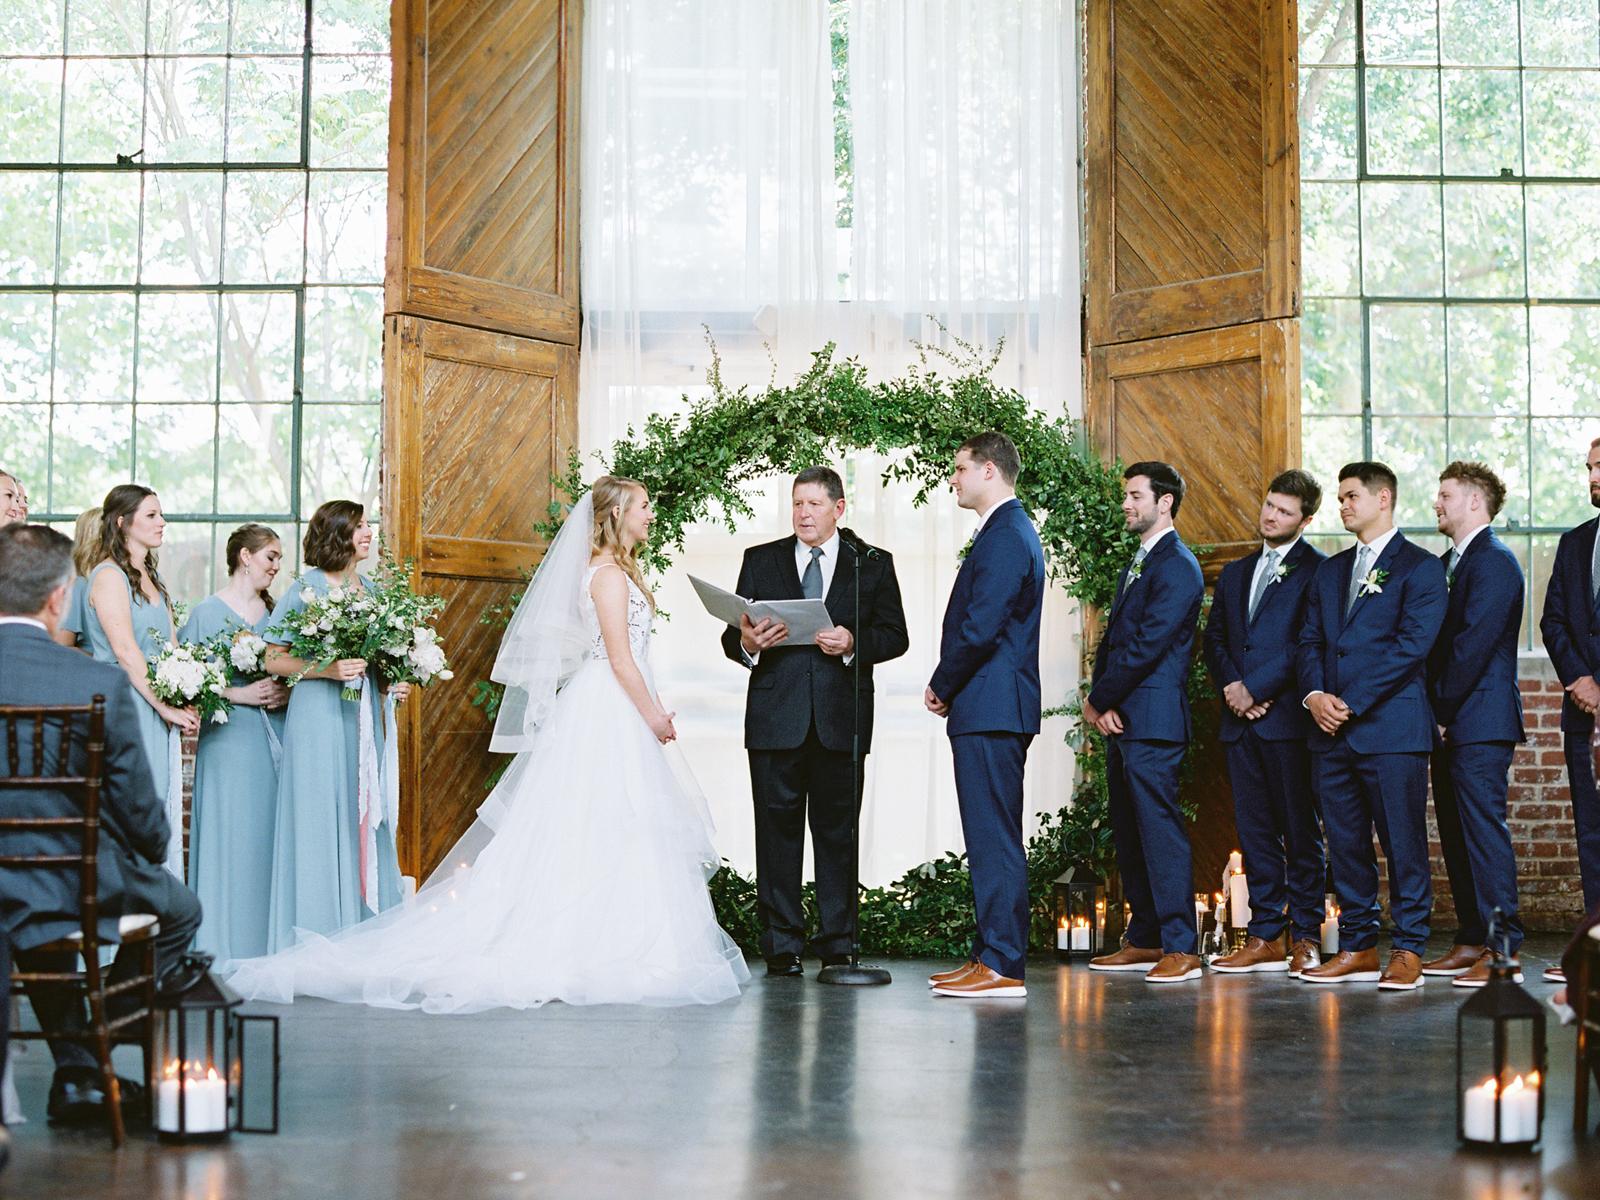 Foundry-At-Puritan-Mill-wedding-photos-venue-atlanta-fine-art-film-photographer41.JPG